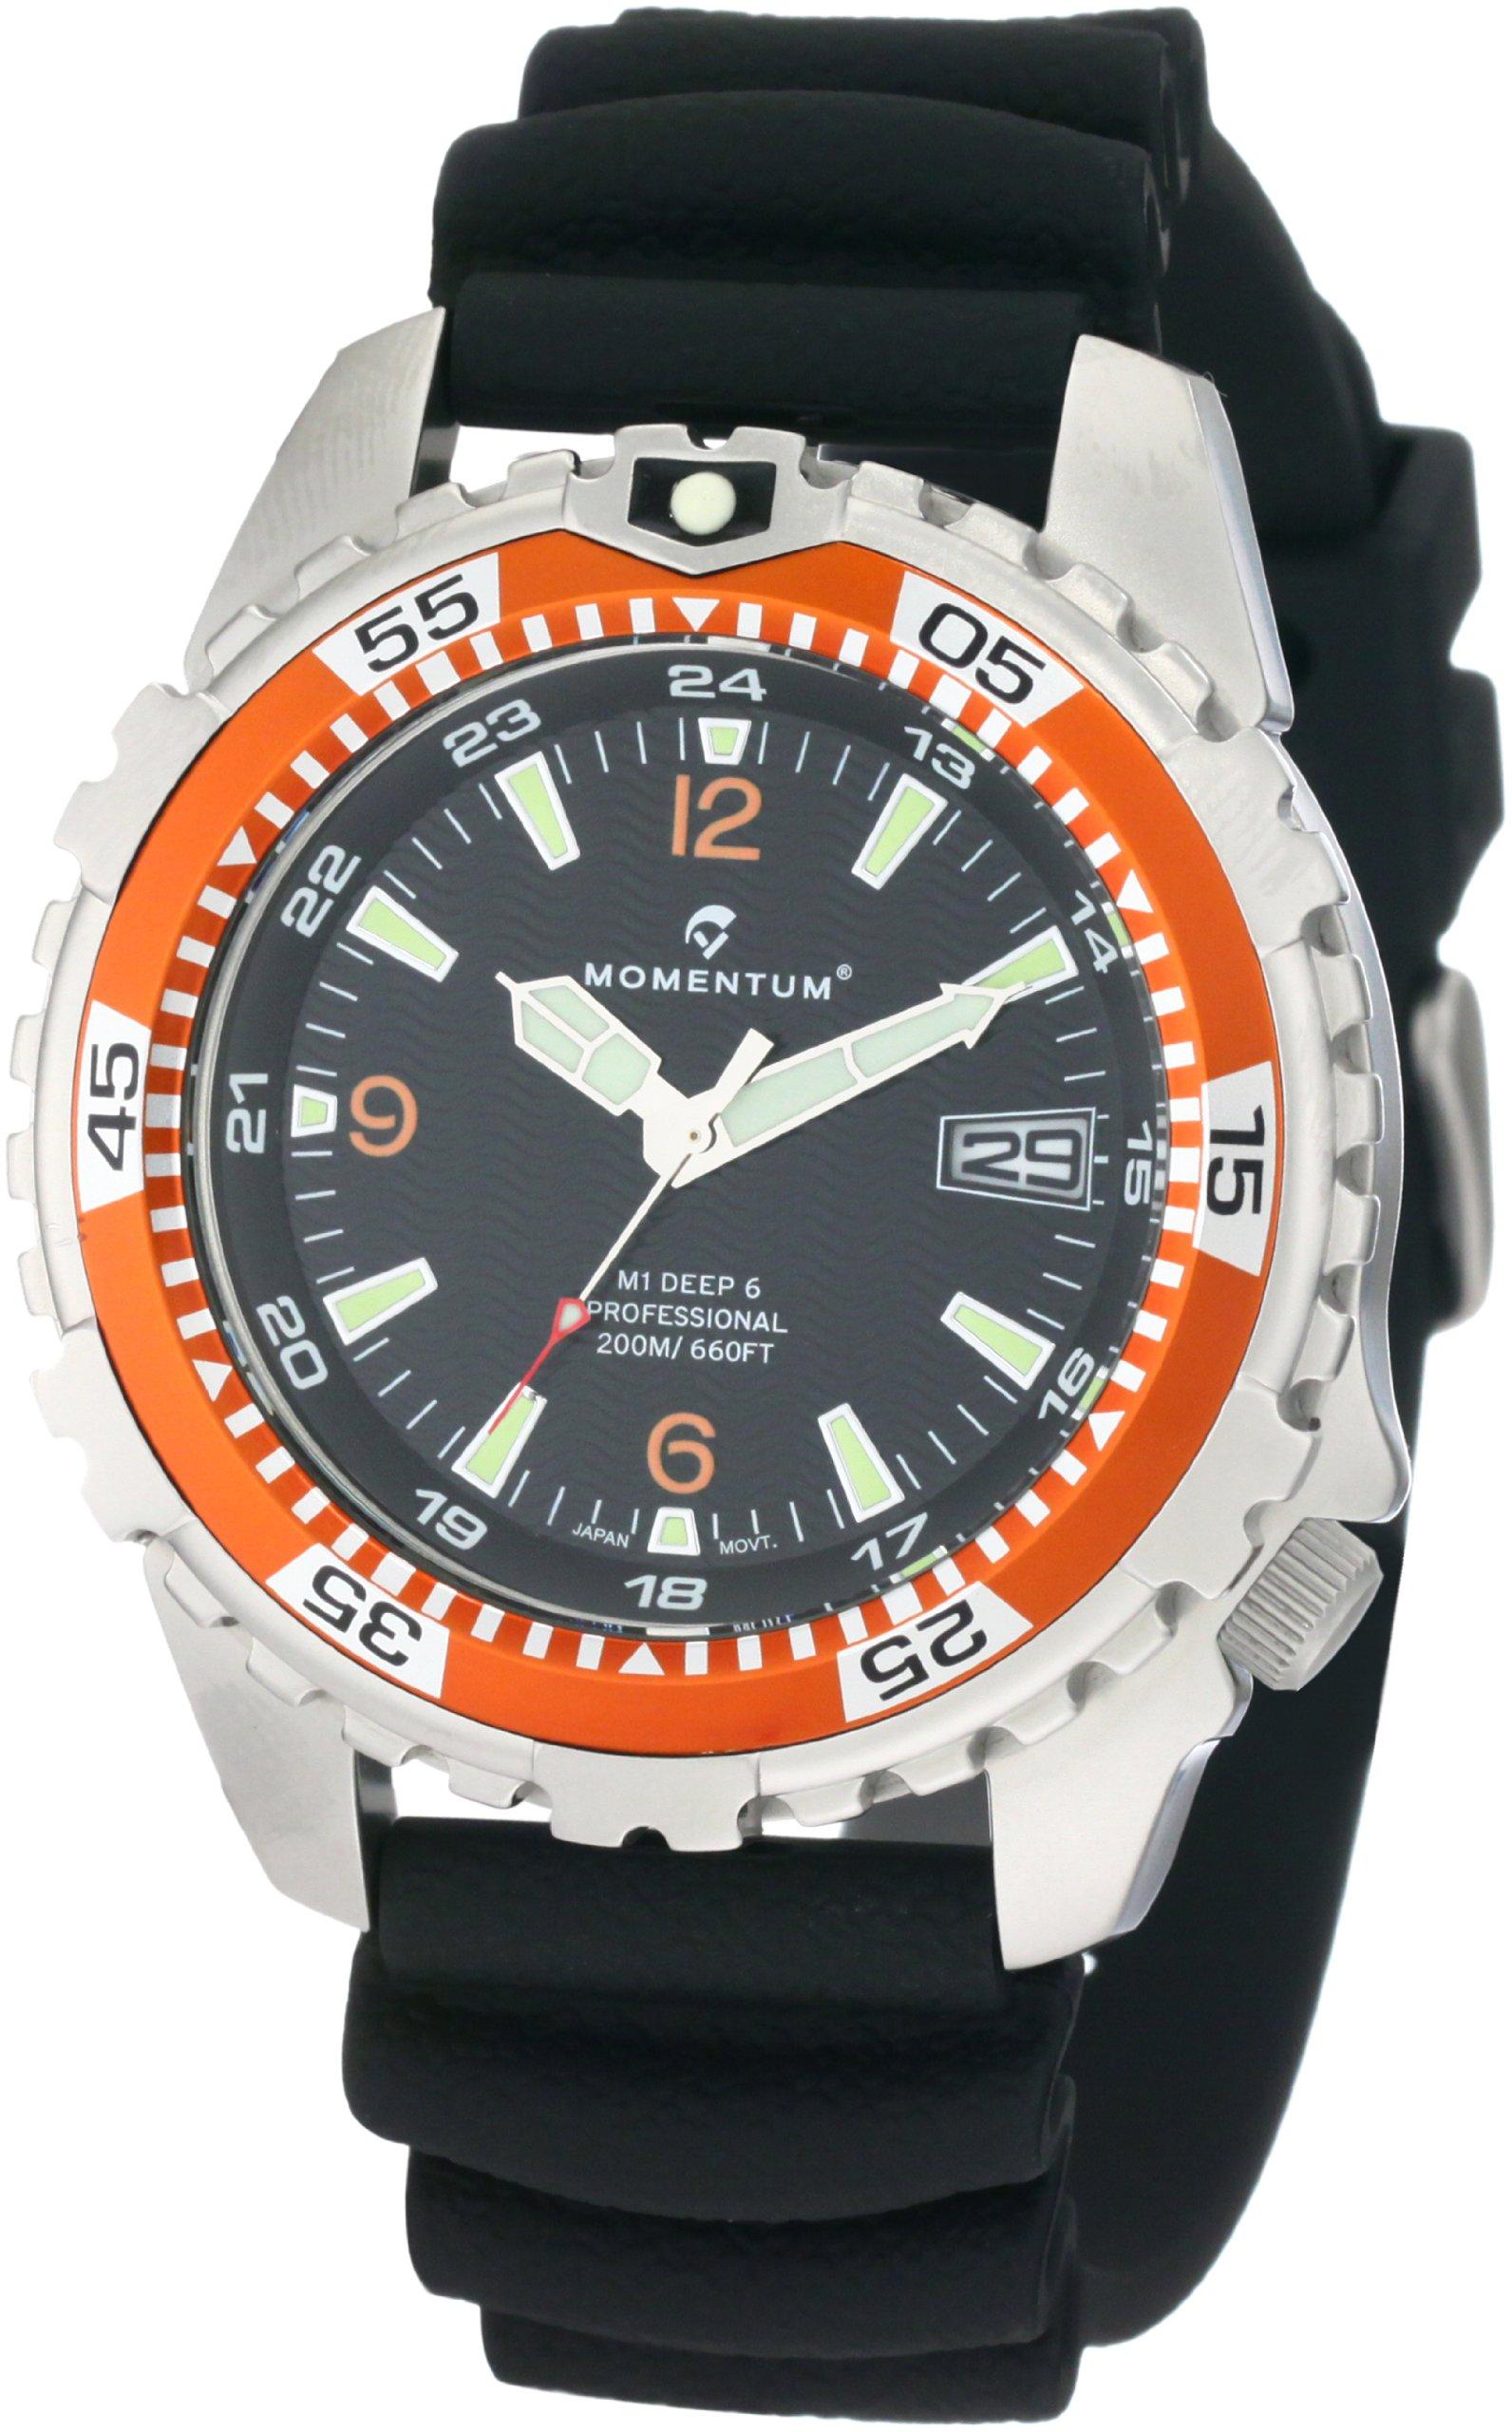 Momentum Men's 1M-DV06O1B M1 Deep 6 Orange Bezel Polyurethane Dive Watch by Momentum